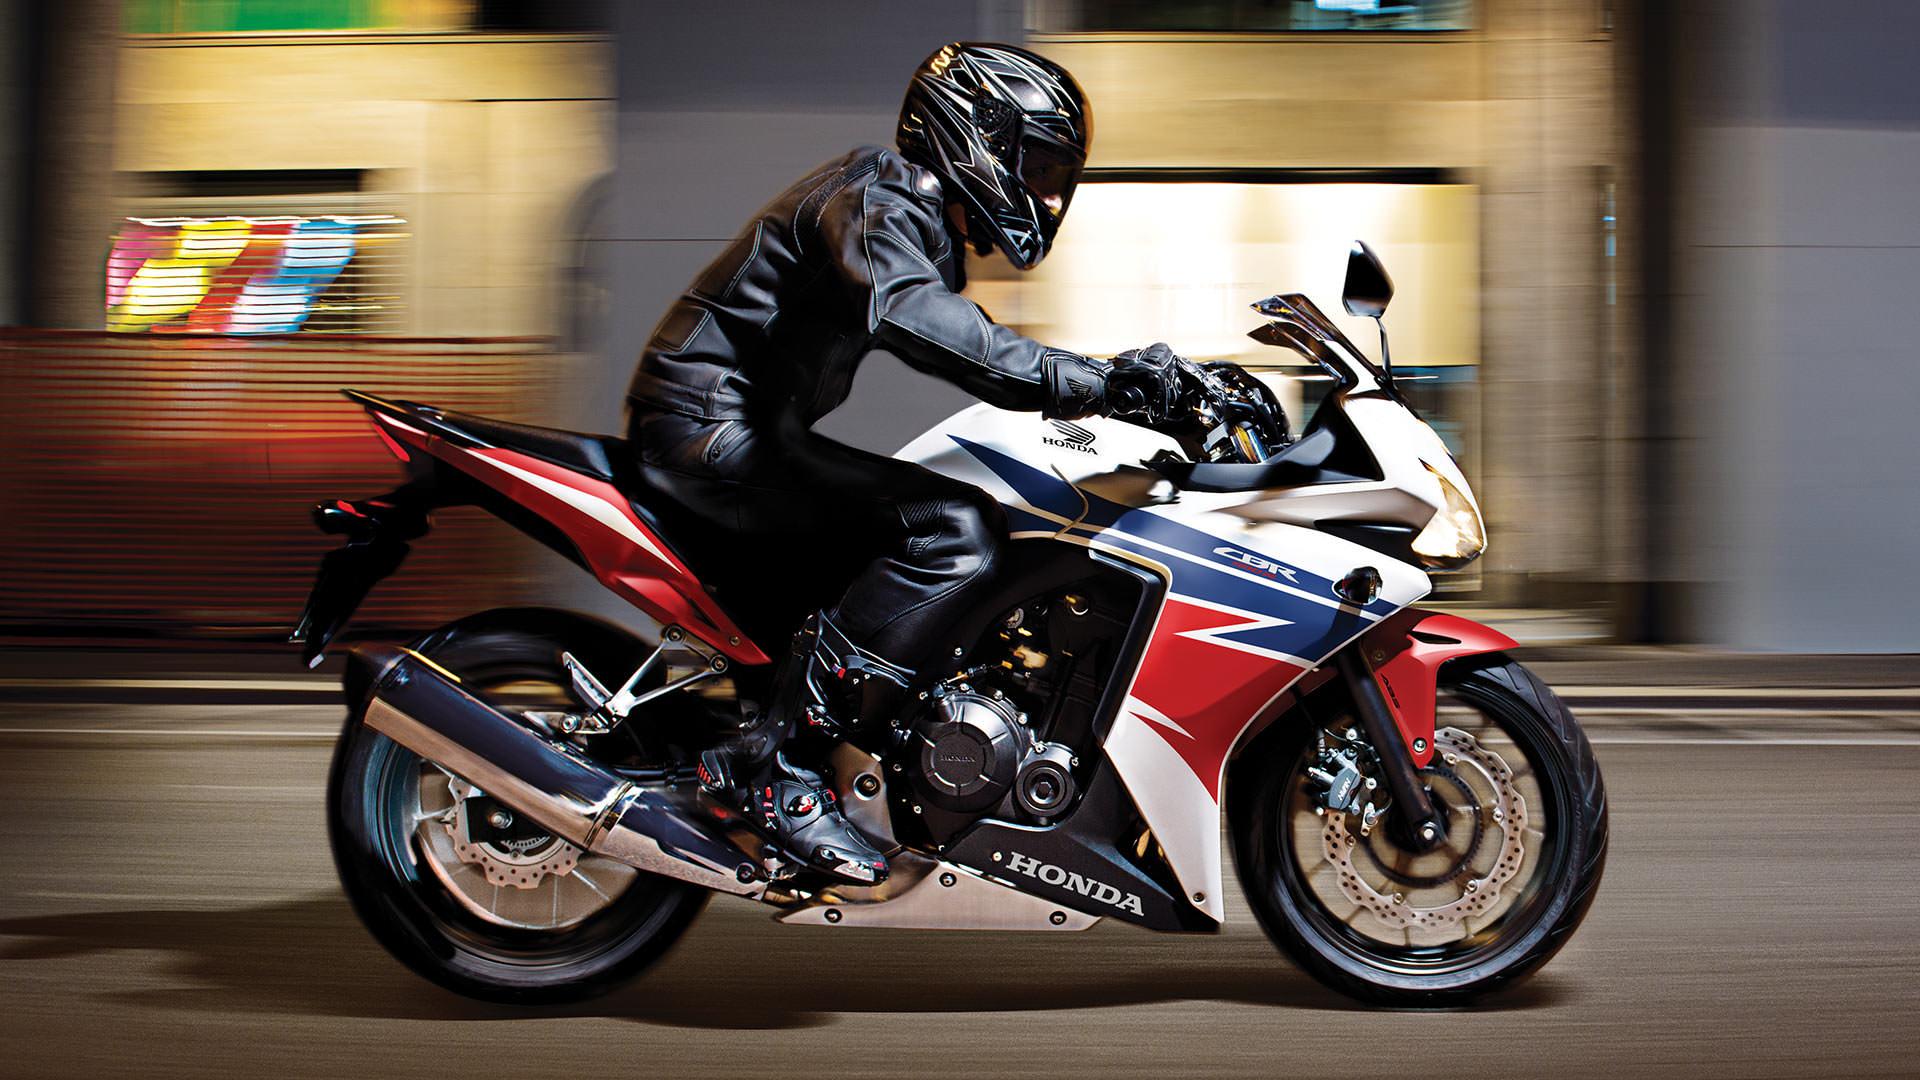 New Shorty Performance Muffler All years CBR500X CBR500F Honda CBR500R 2013